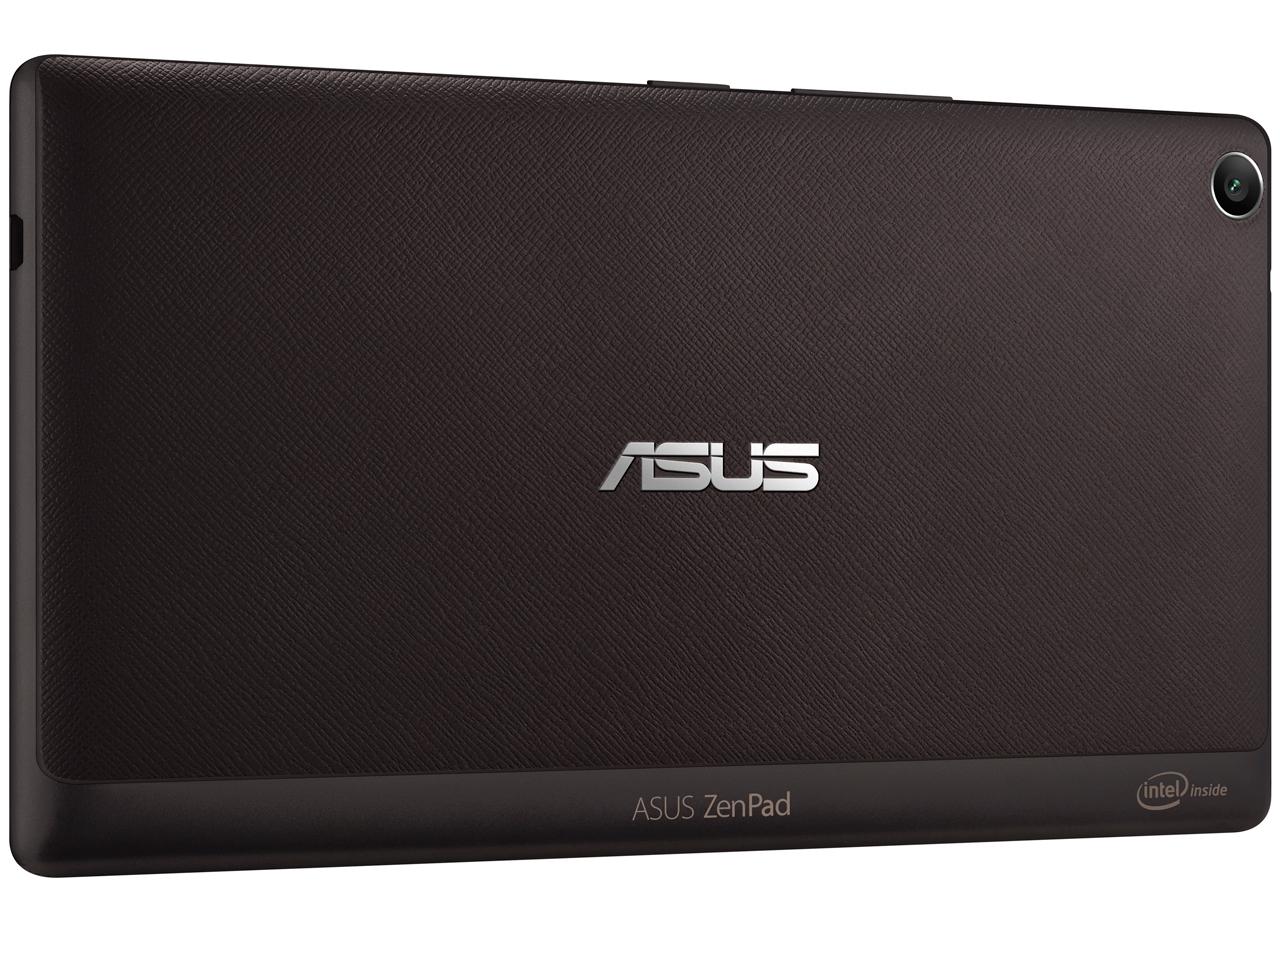 �w�{�� �w��1�x ASUS ZenPad 7.0 Z370C-BK16 [�u���b�N] �̐��i�摜